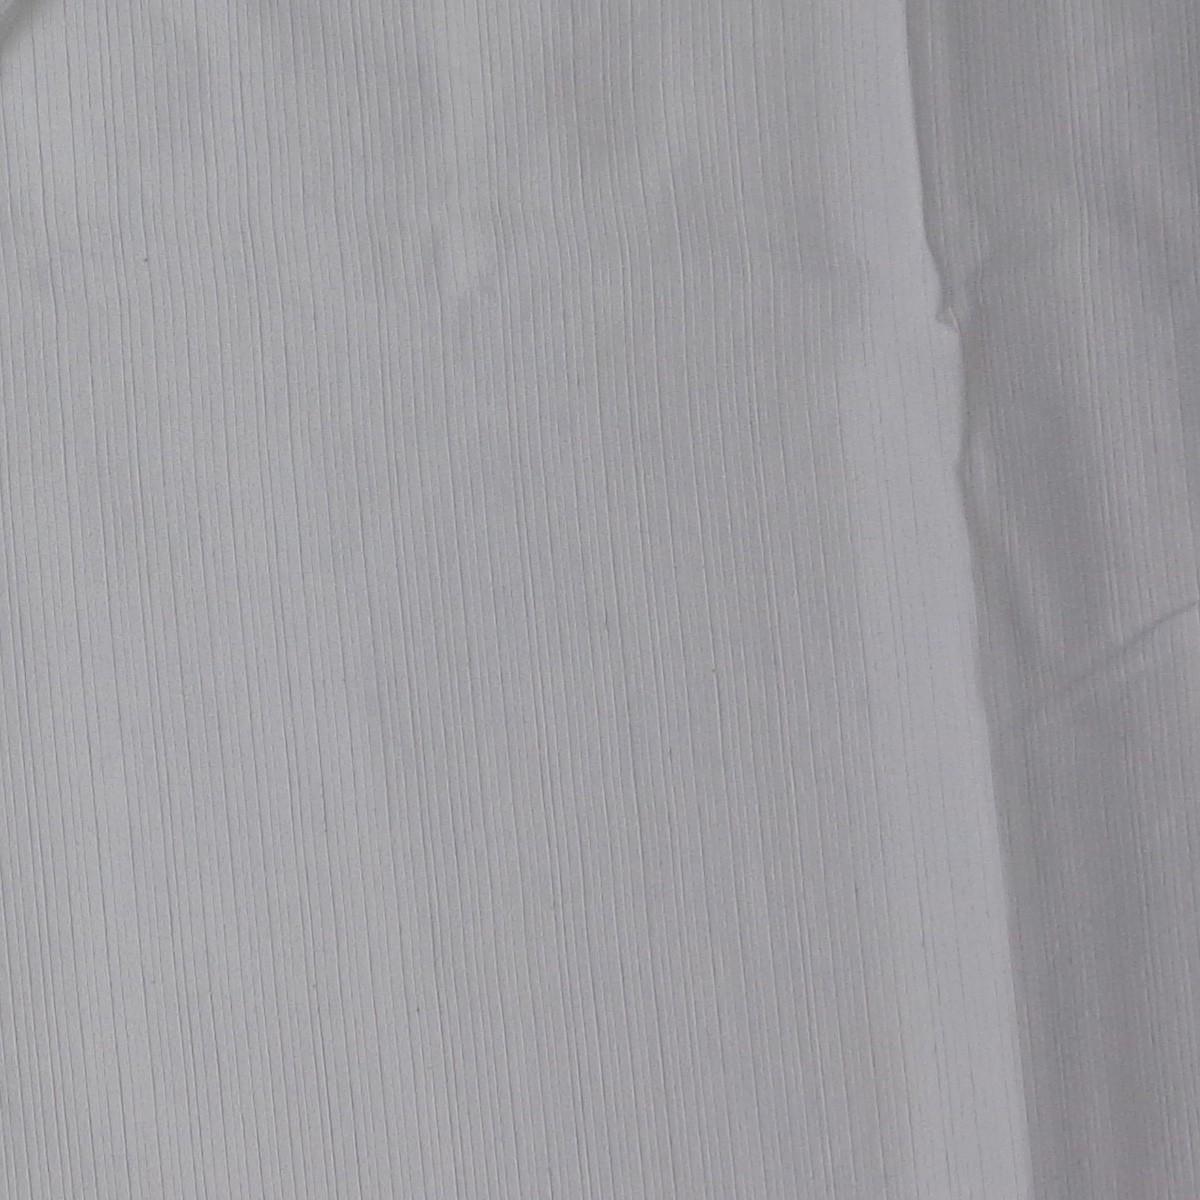 Cortina Para Sala Rústica Pantex Crú 2,60 x 1,70 Bella Janela